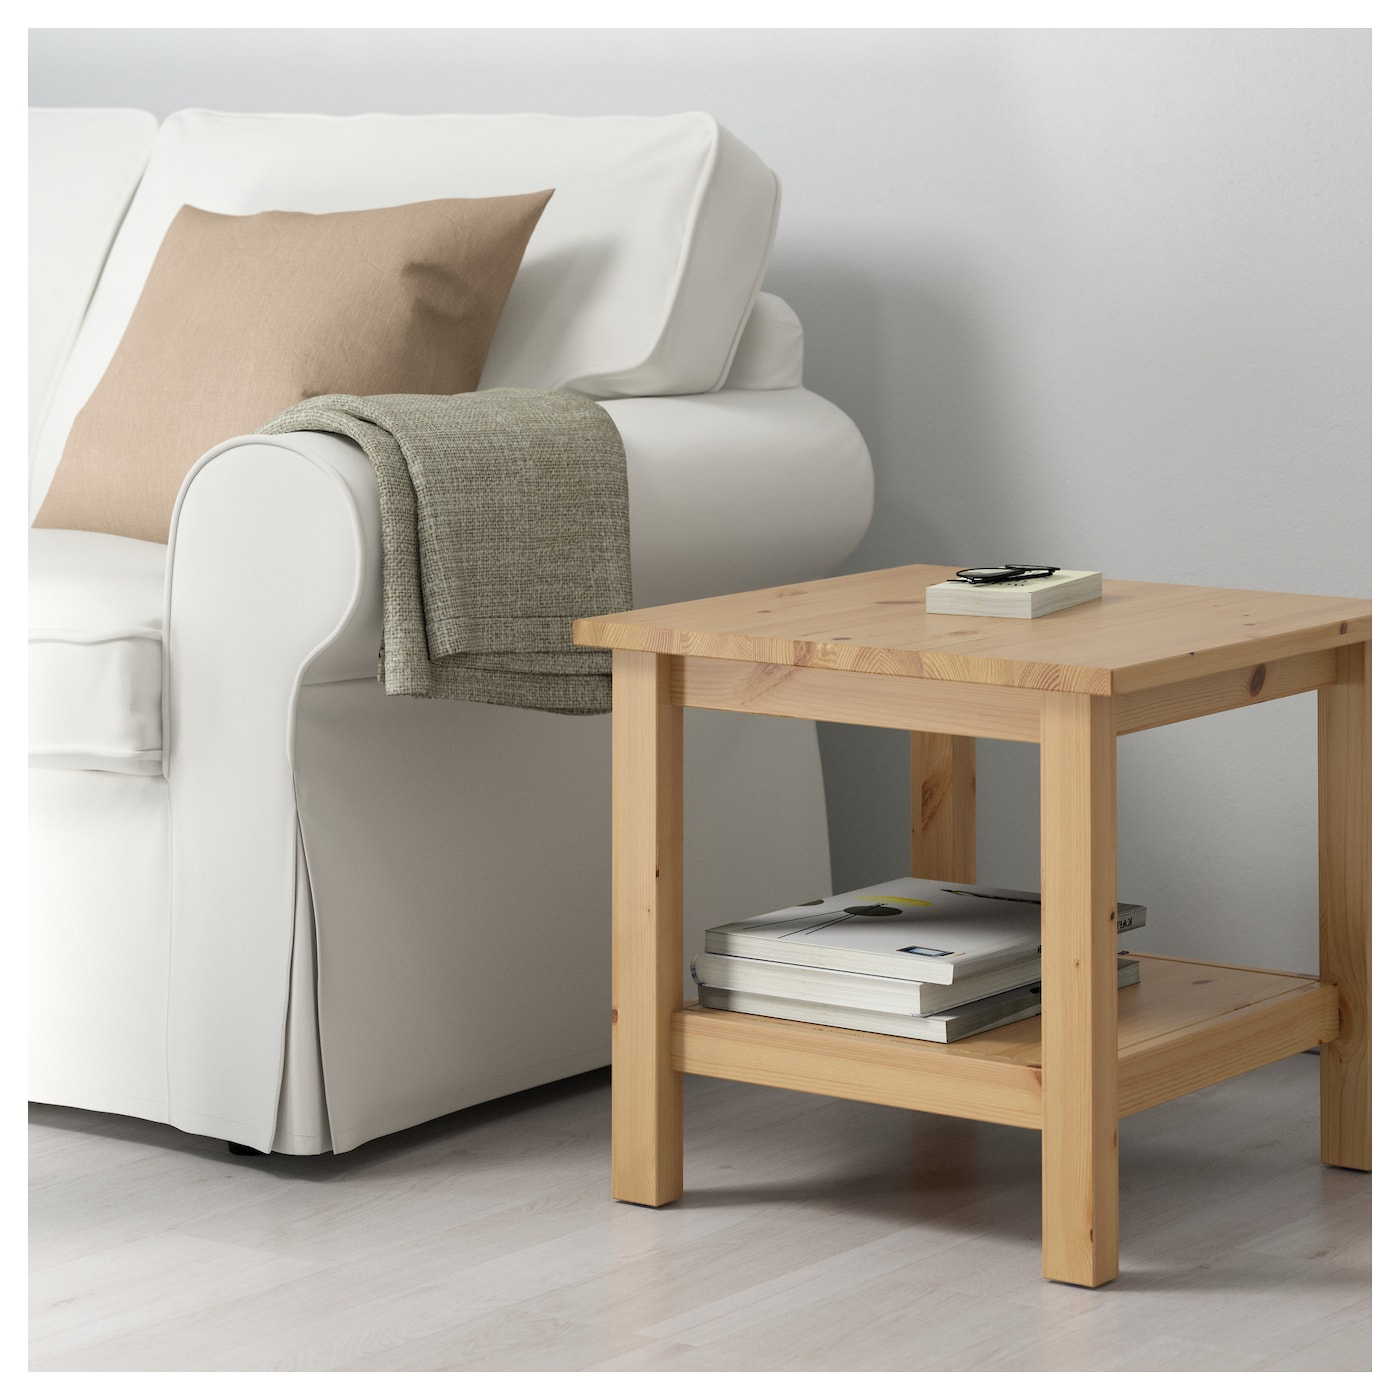 HEMNES Side table Light brown 55×55 cm IKEA